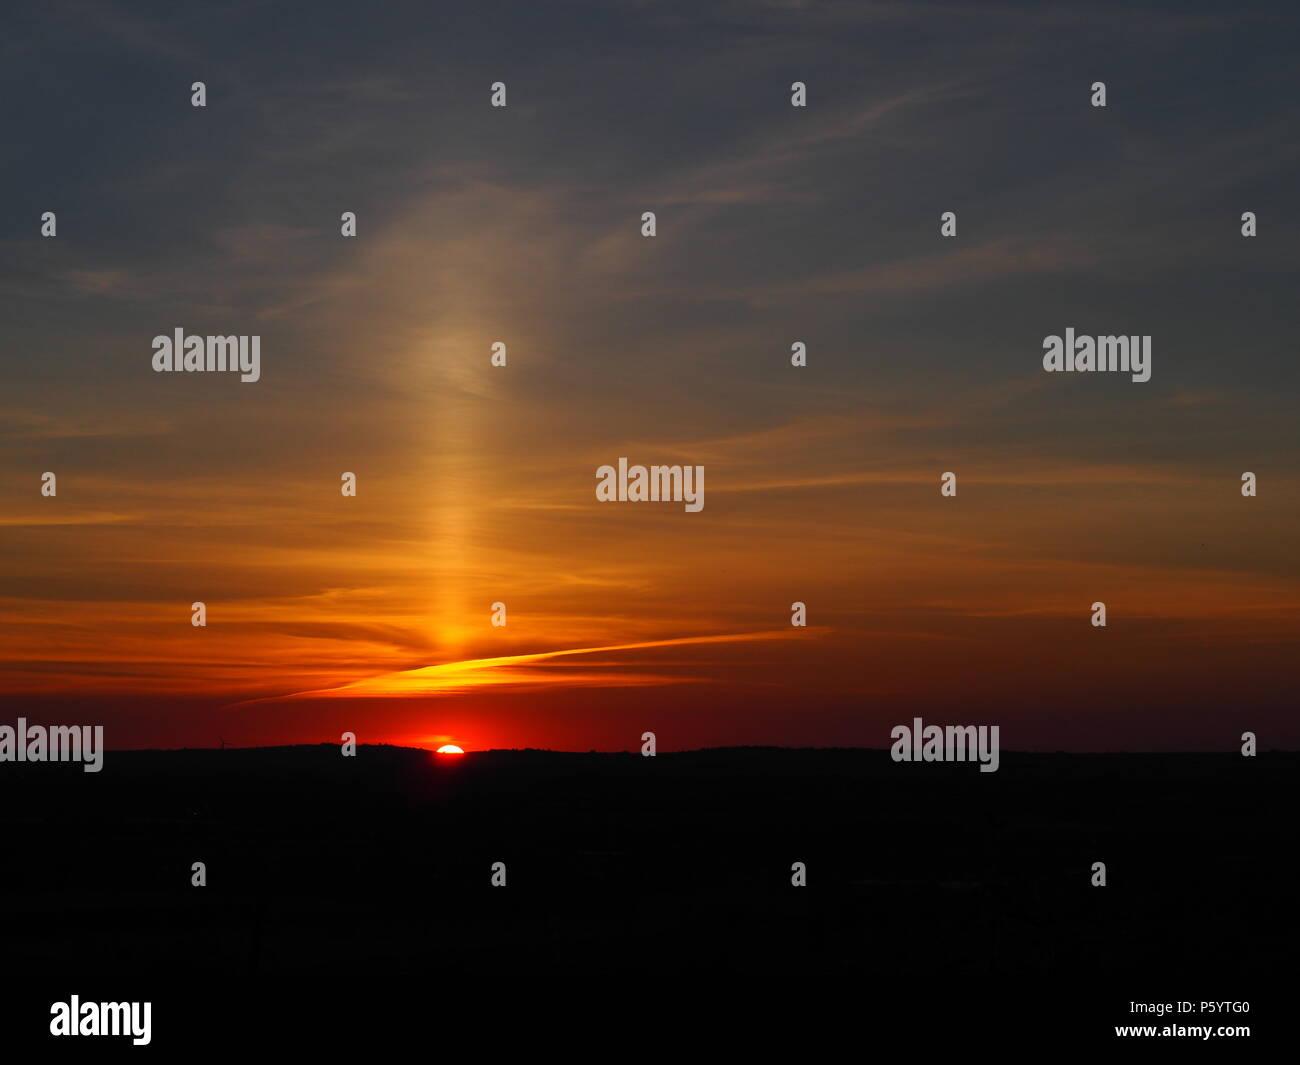 Rare Sun Pillar cirrus cloud  phenomenon above a vivid sunset over Aylesbury Vale, Buckinghamshire seen around midsummer. - Stock Image